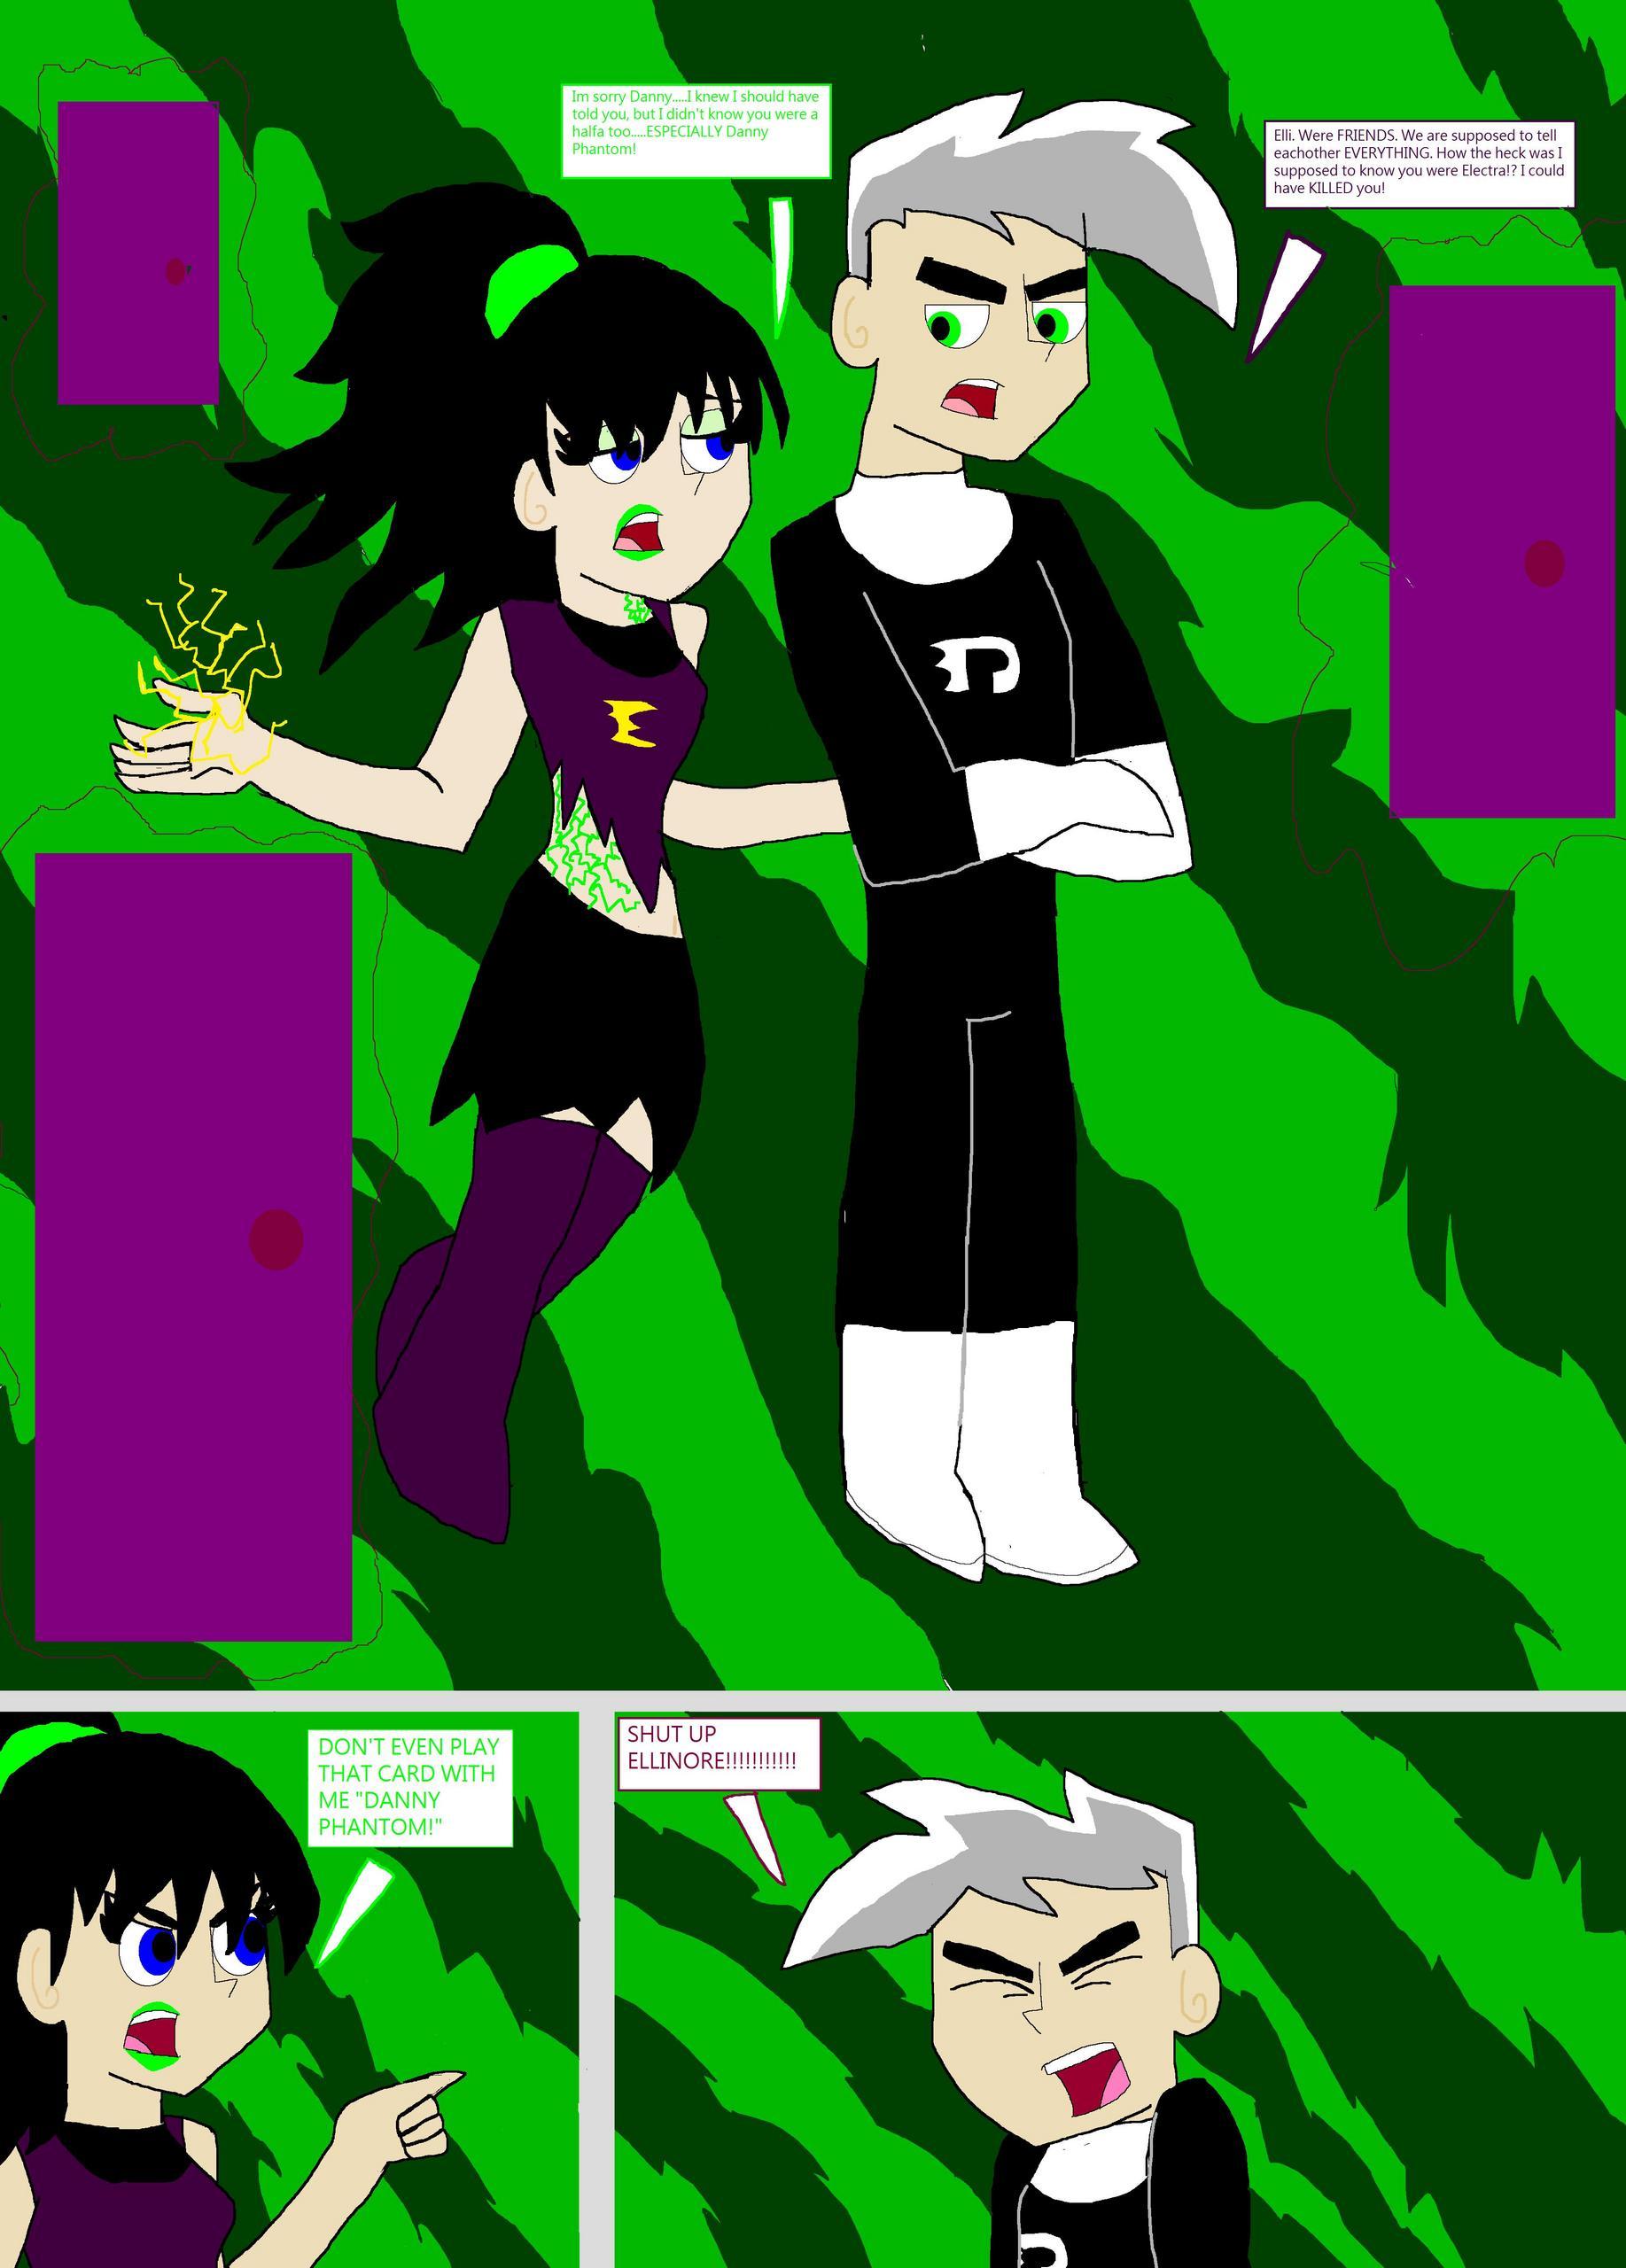 Secrets Tear Friends Apart Danny Phantom Oc S Photo 28609127 Fanpop